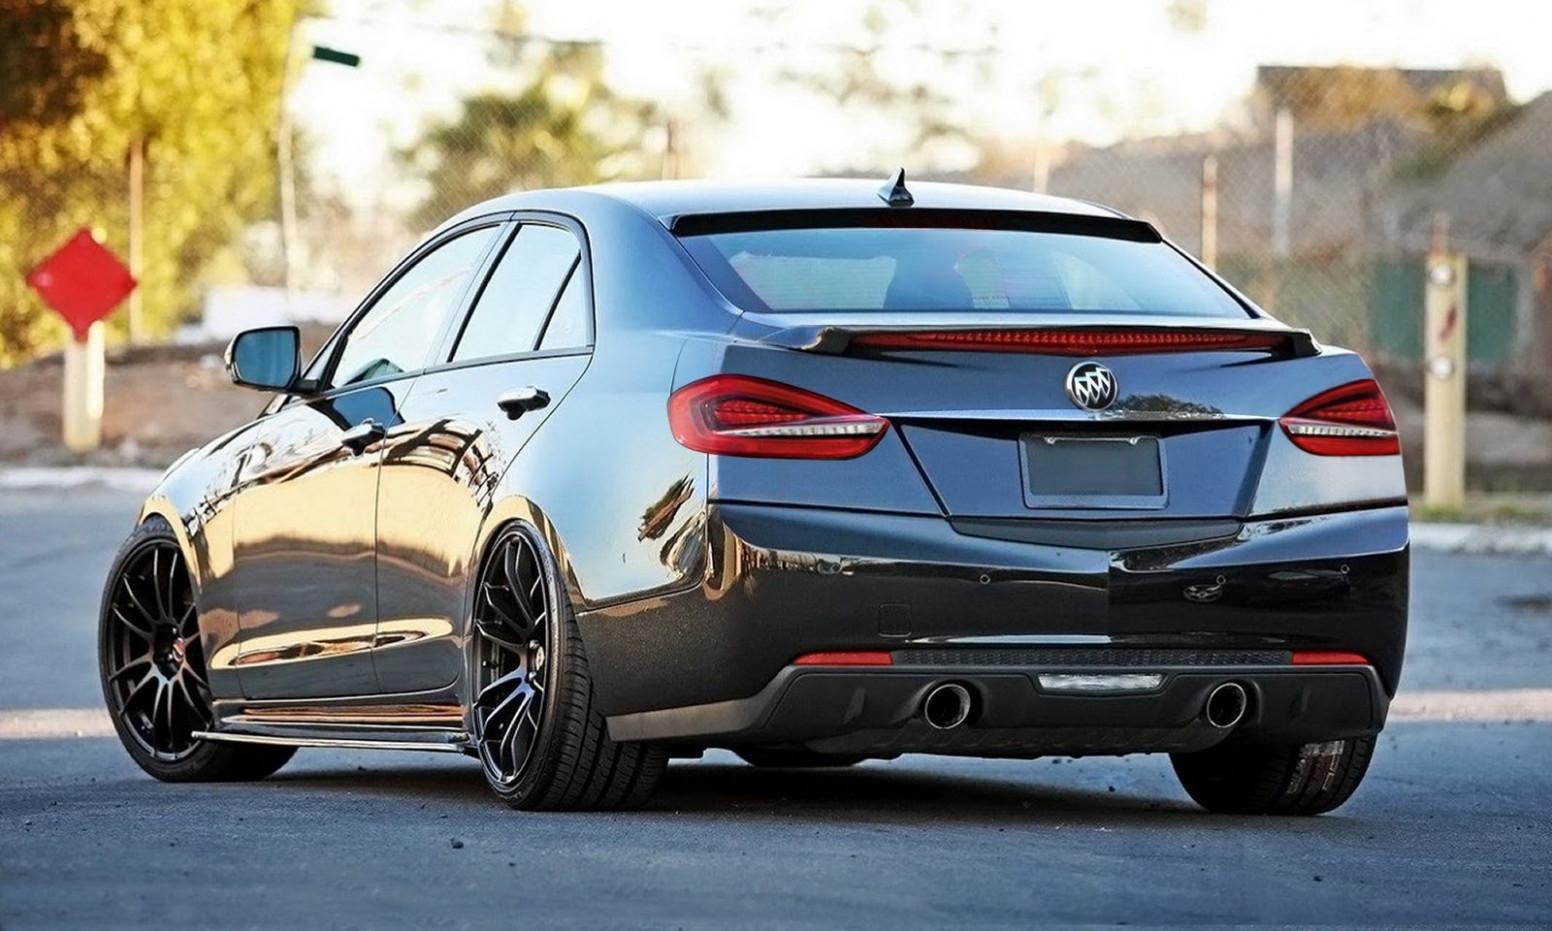 Interior Buick Regal Grand National 2022